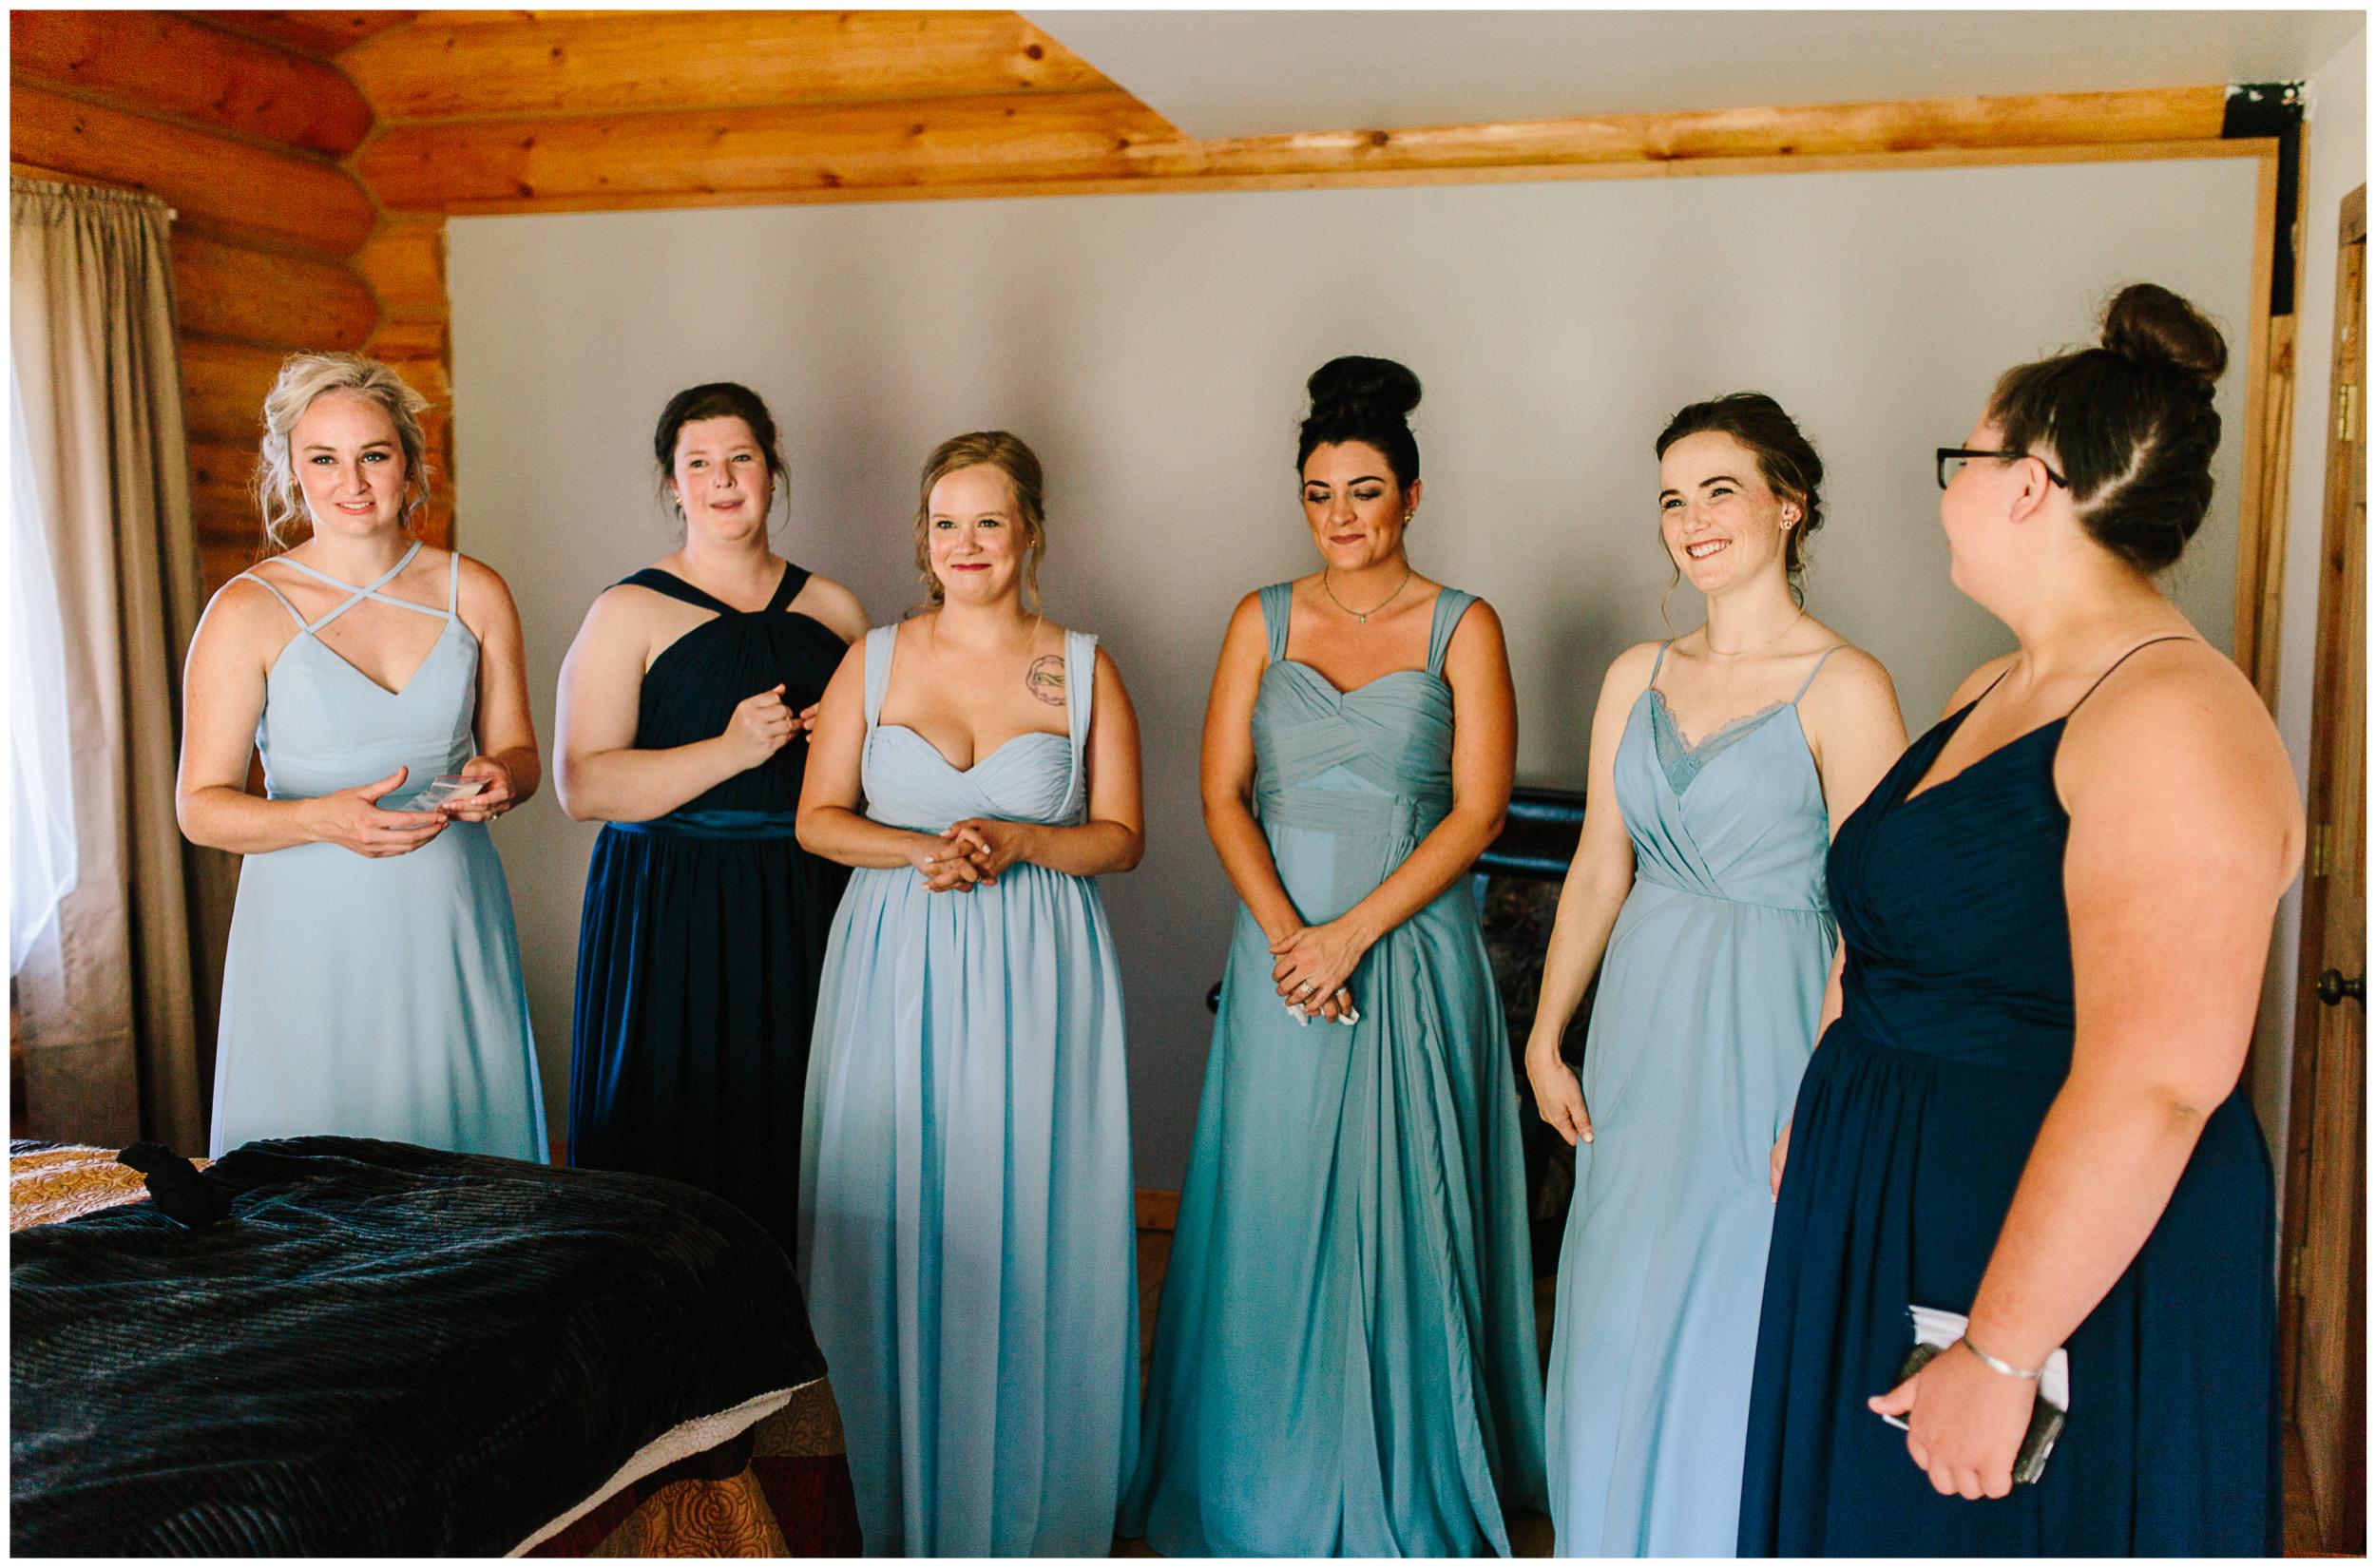 redlodge_montana_wedding_11.jpg